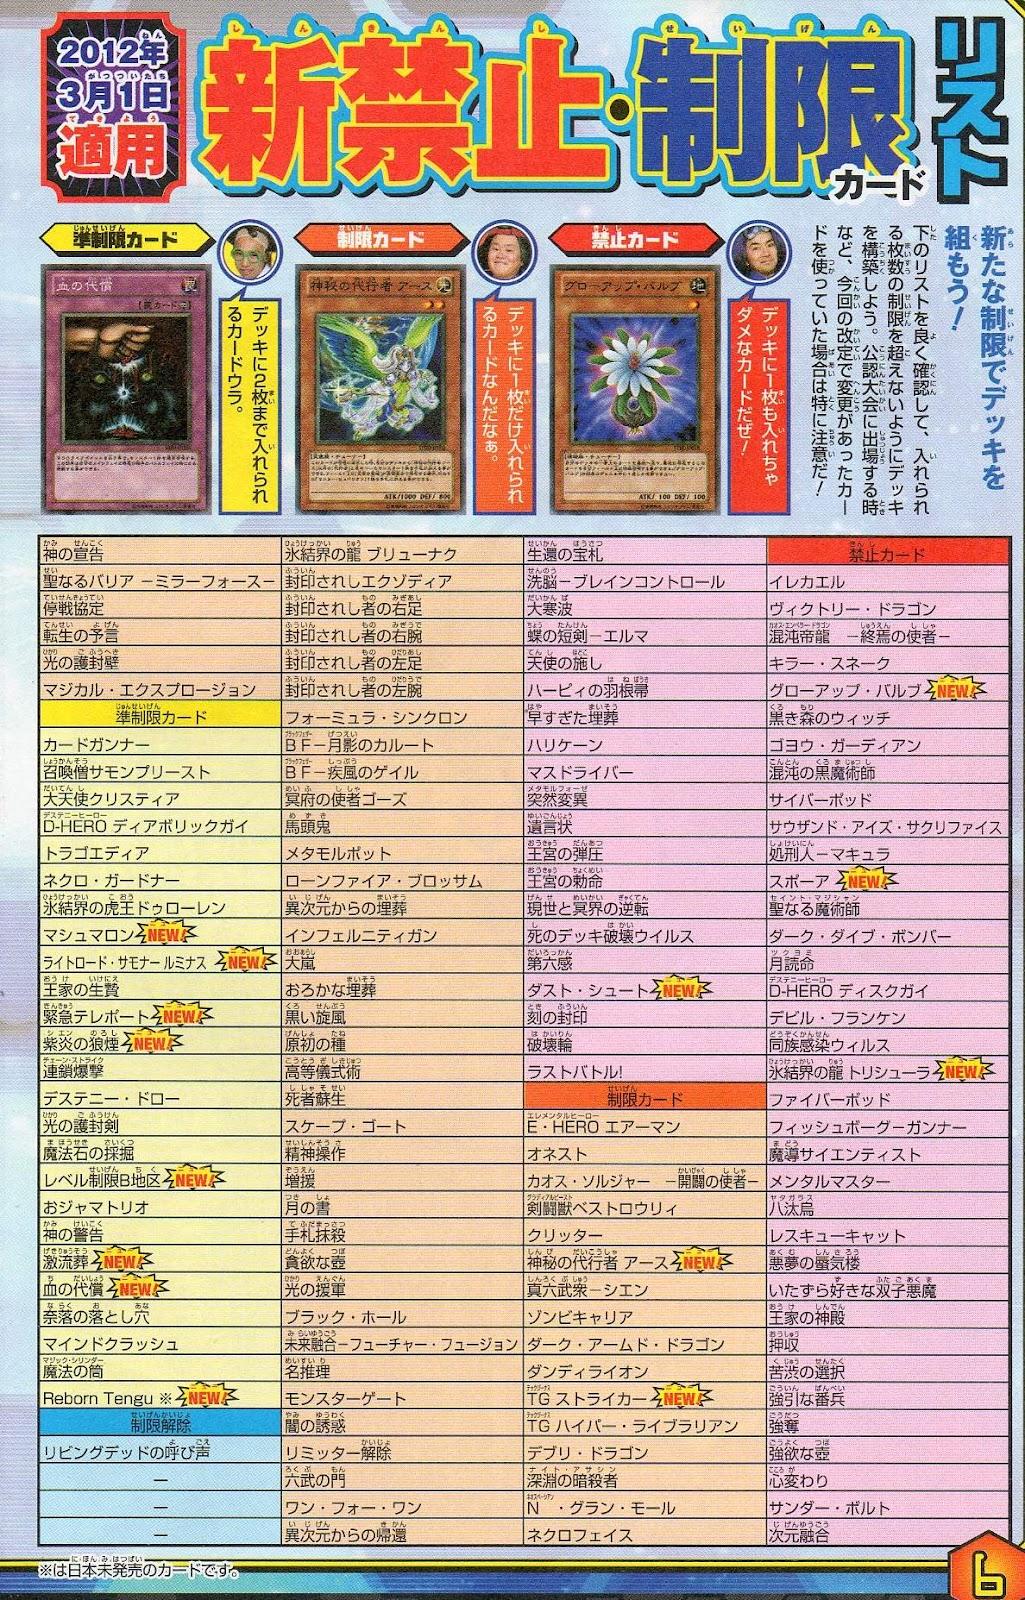 mnitwining nueva lista de yu gi oh marzo 2012